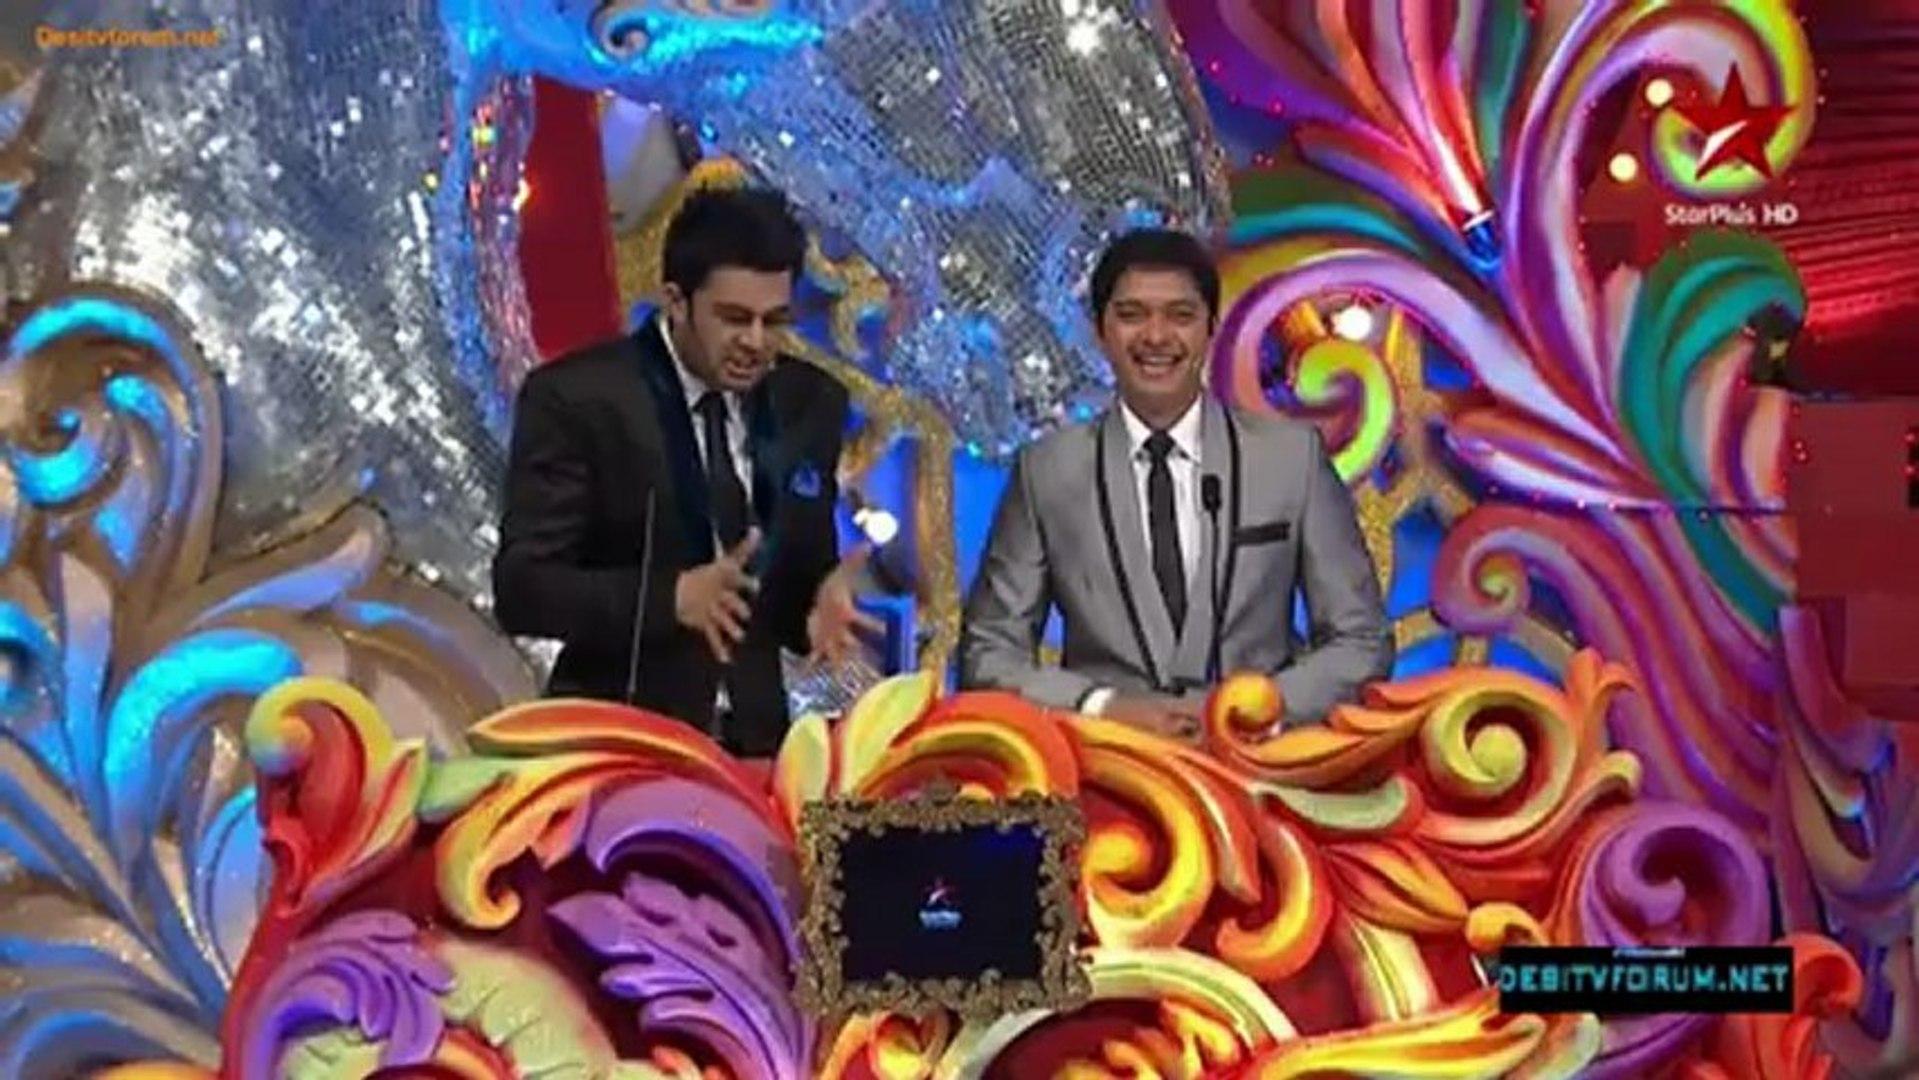 Big Star Entertainment Awards 2012 720p 31st December 2012 Watch Online Video HD pt10